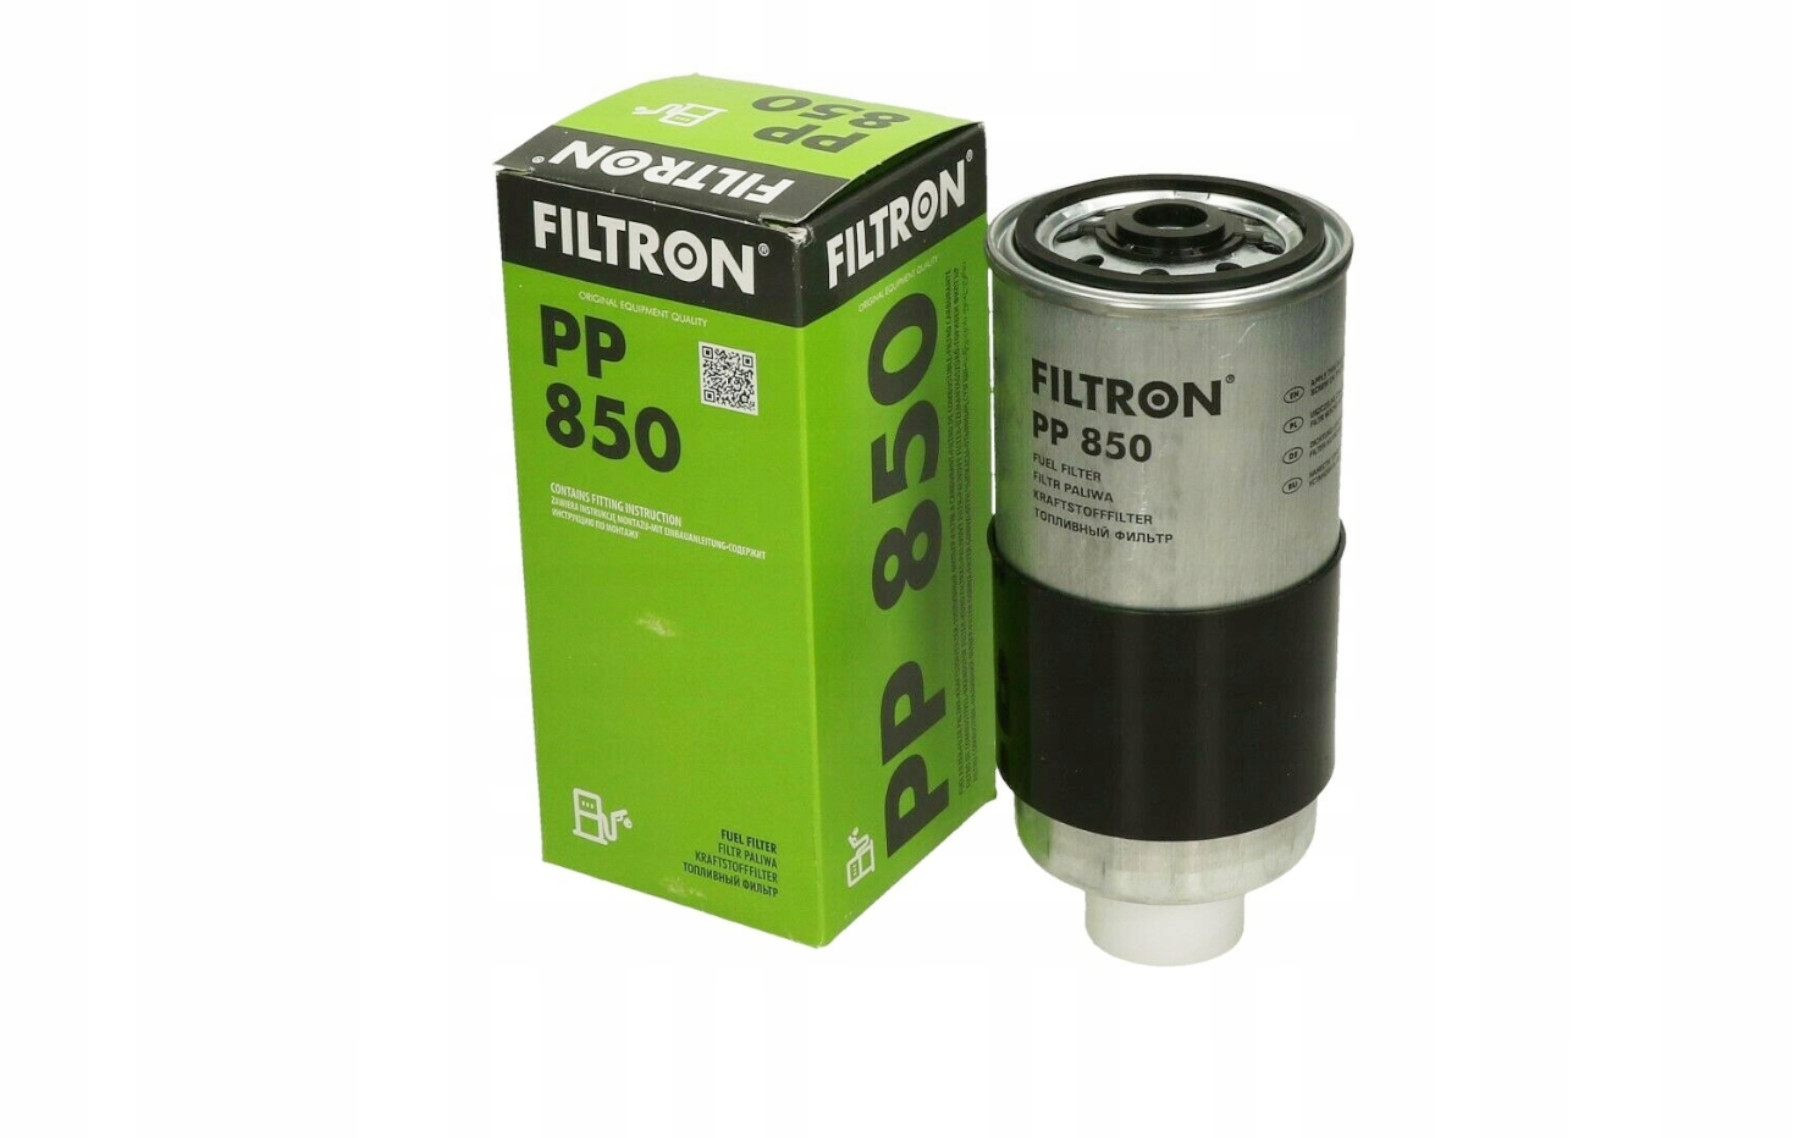 фильтр топлива audi 80 b4 a6 c4 c5 passat b5 19 tdi